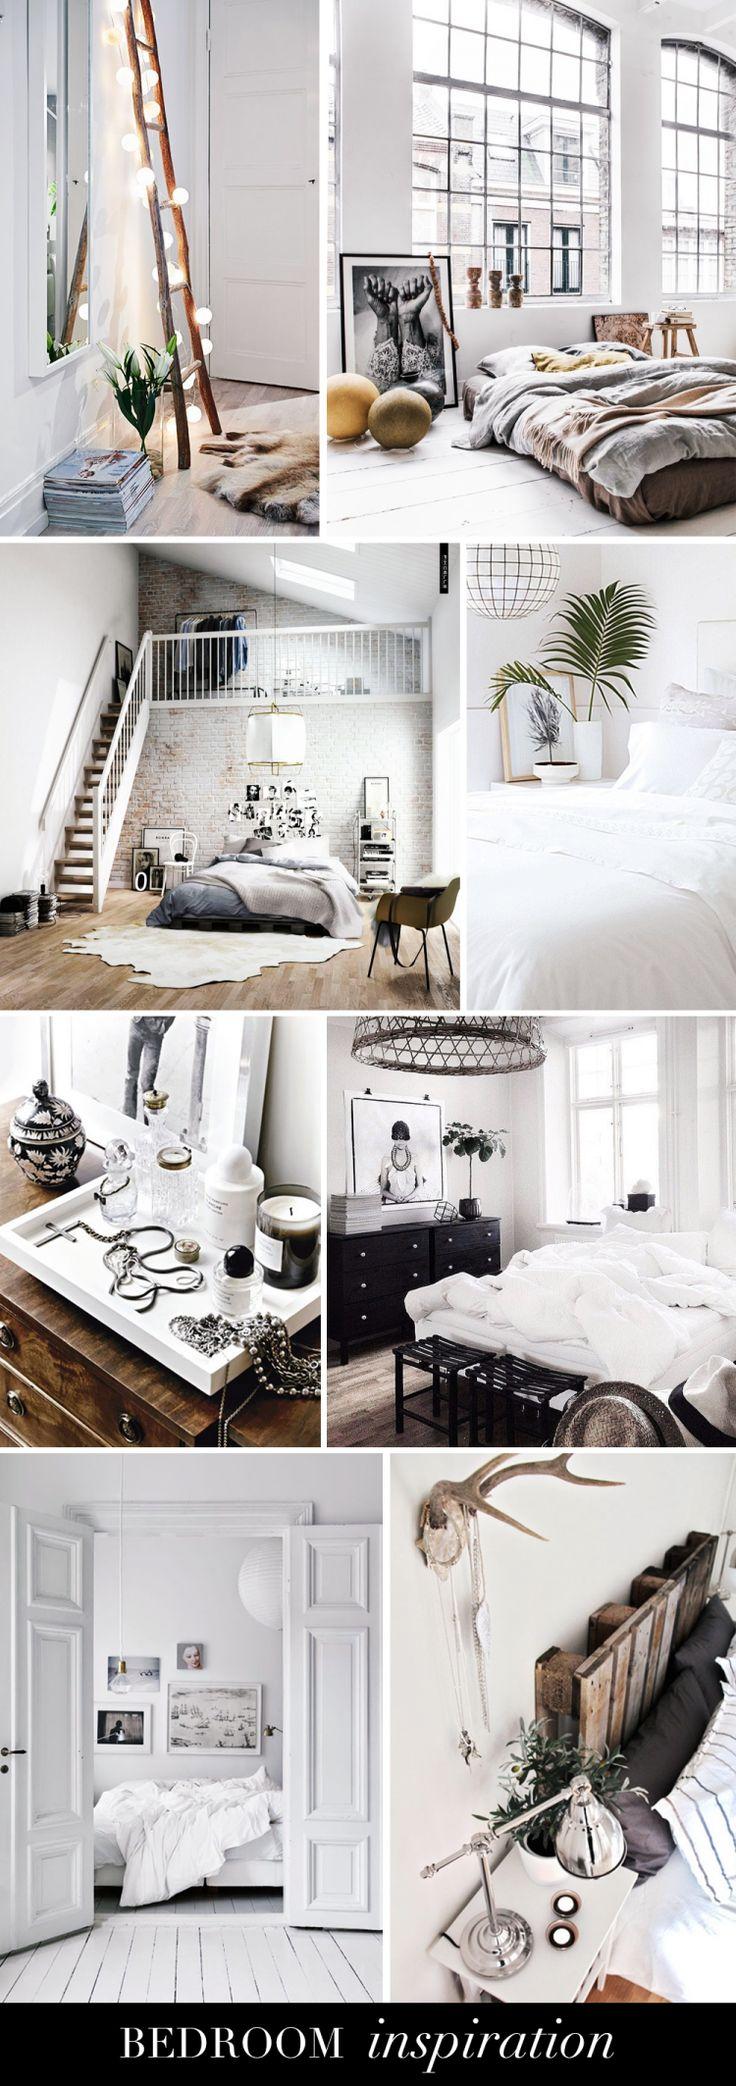 Interior inspiration: bedrooms